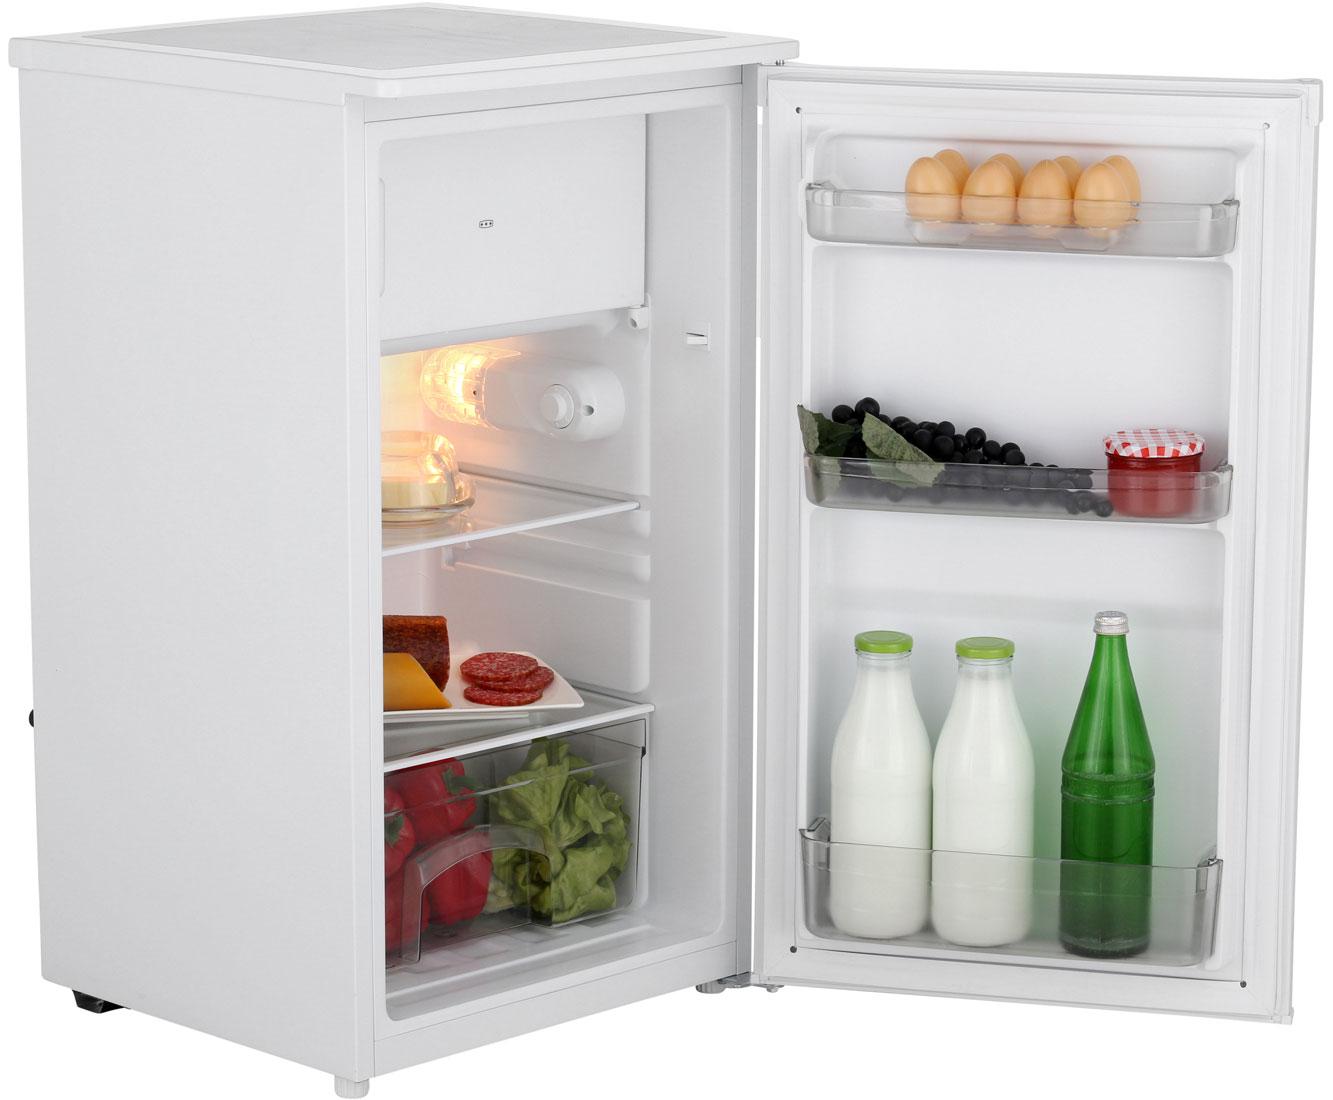 Aeg Unterbau Kühlschrank Dekorfähig : Kühlschrank energiesparend kühlschrank unterbau a 43 43